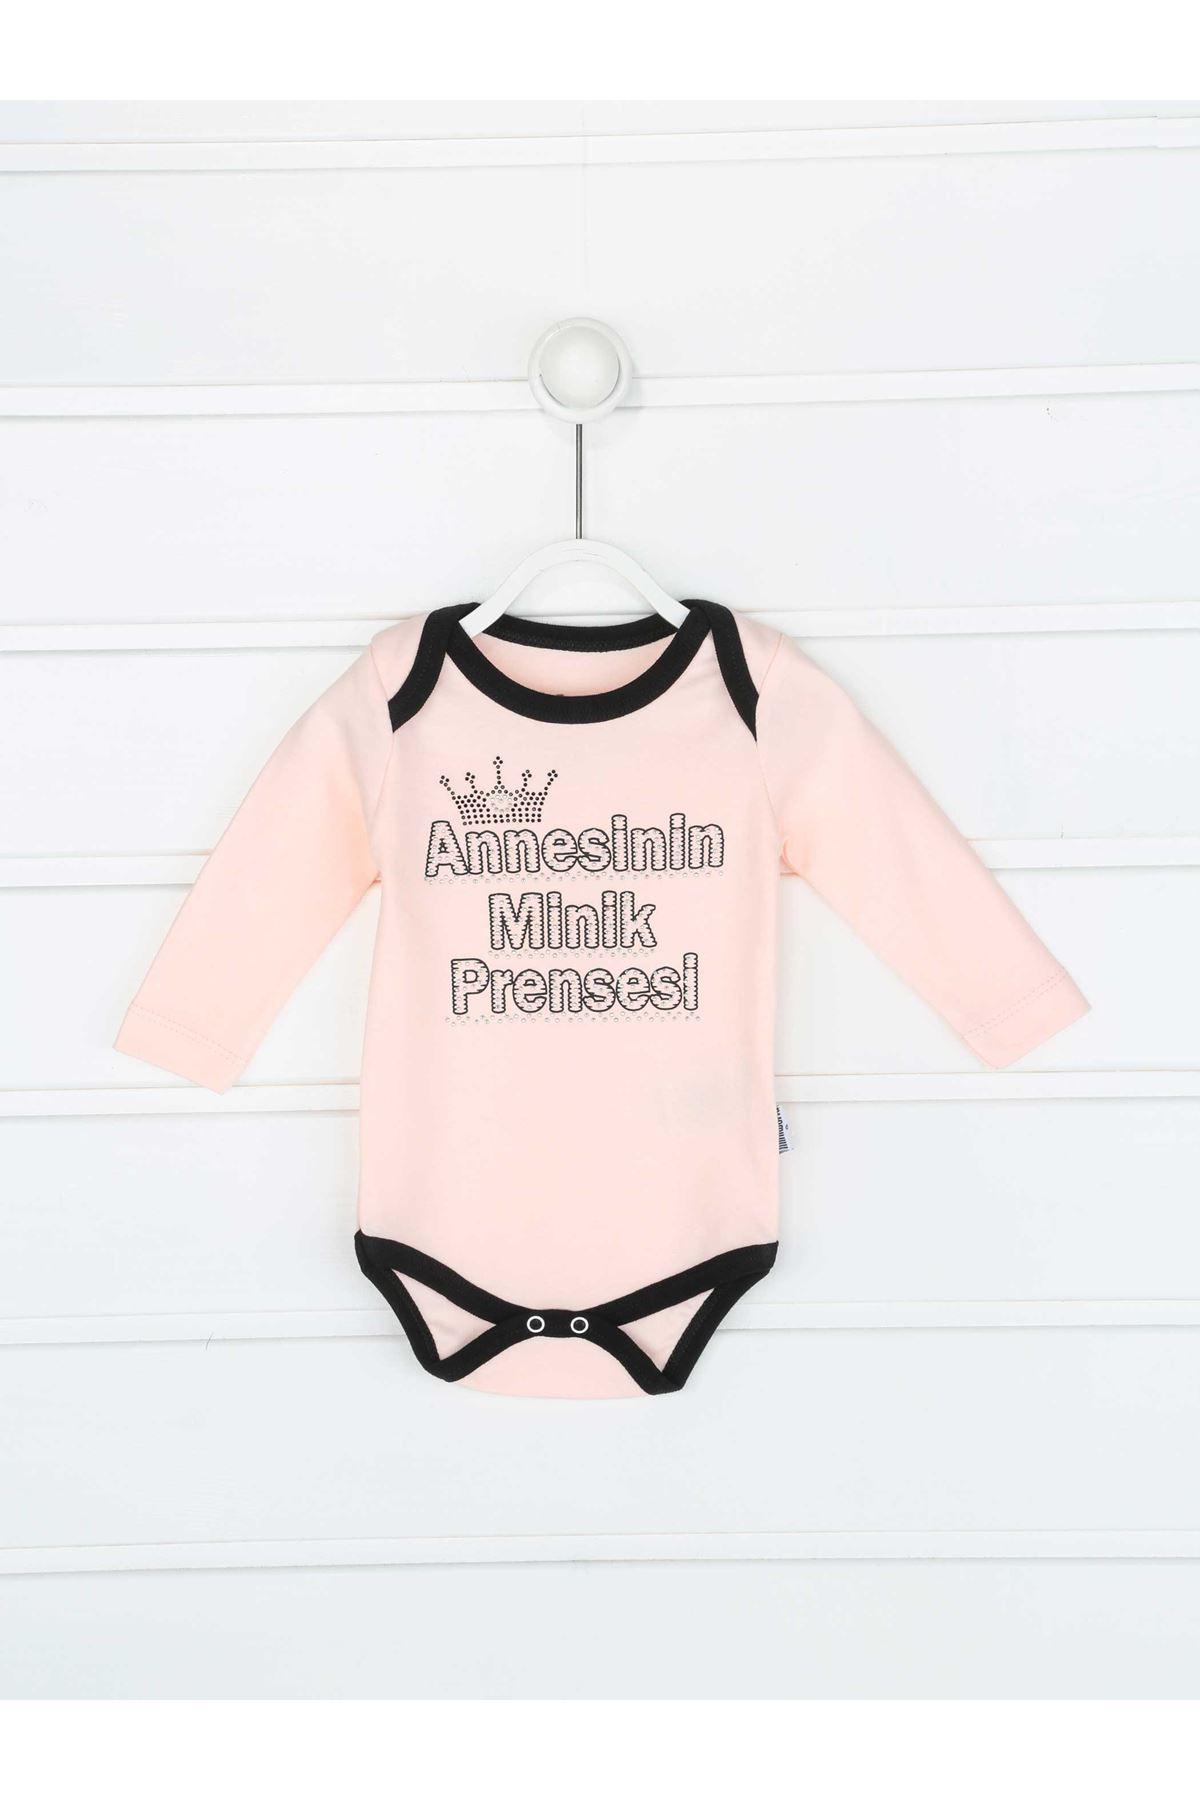 Powder Anenesinin Tiny Princess Baby Girl 3 PCs Set